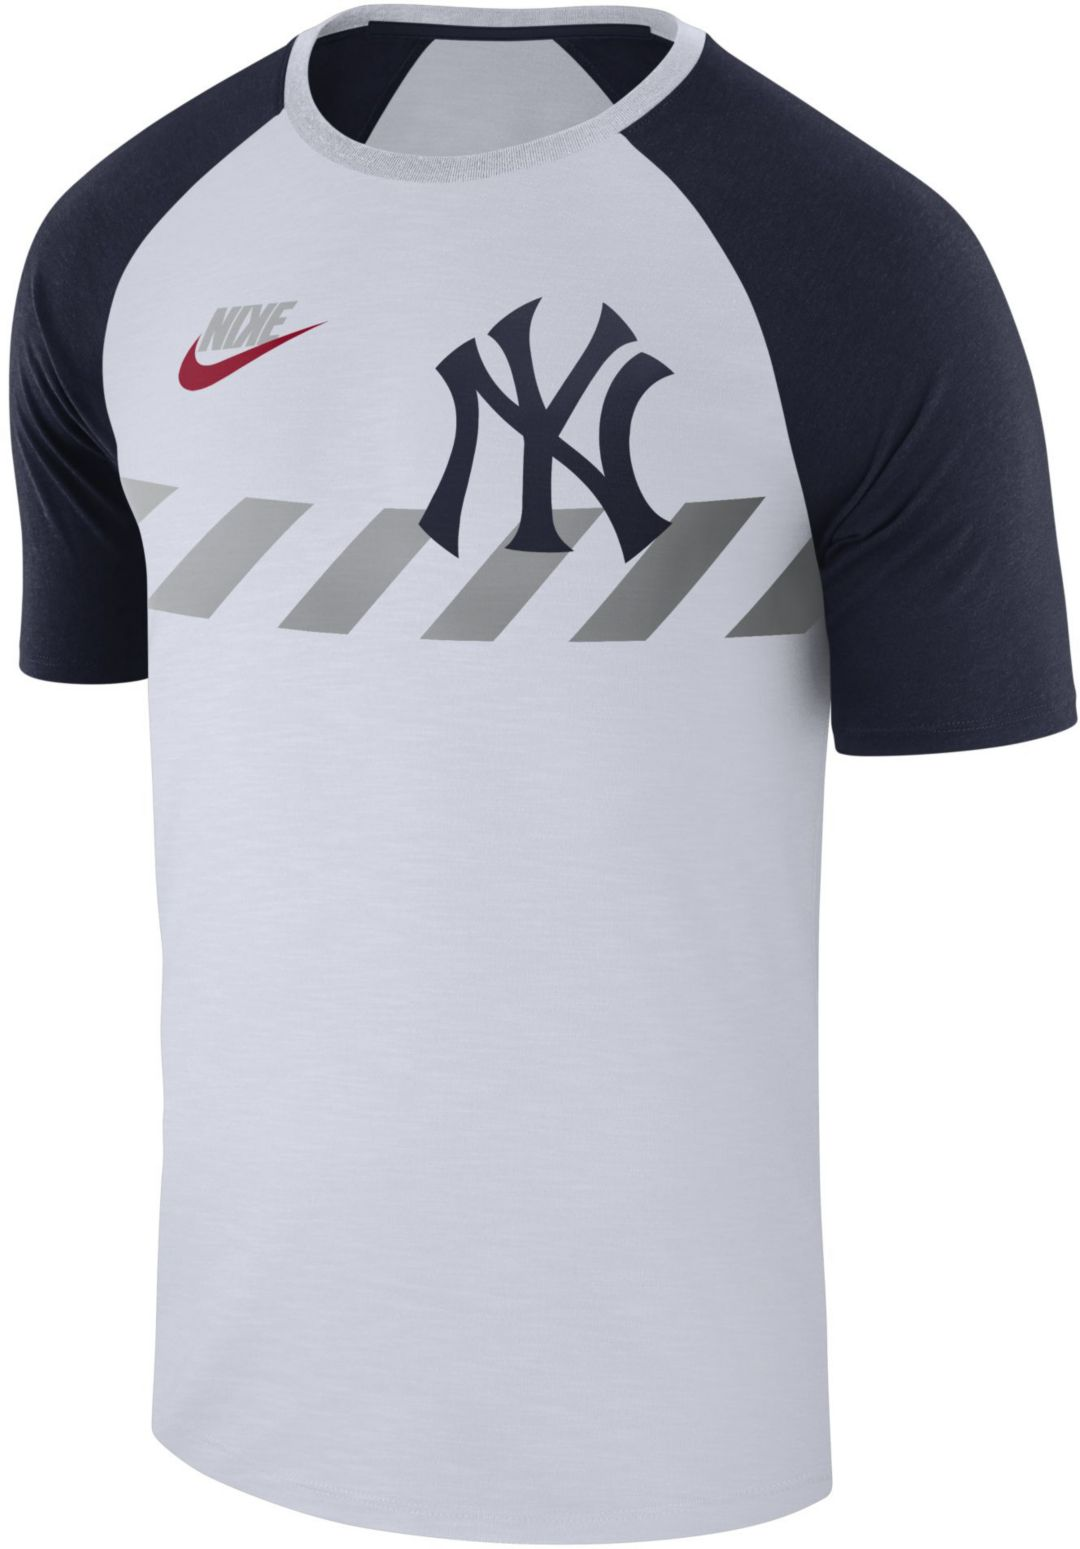 329cd9c8e0 Nike Men's New York Yankees Dri-FIT Raglan T-Shirt. noImageFound. Previous